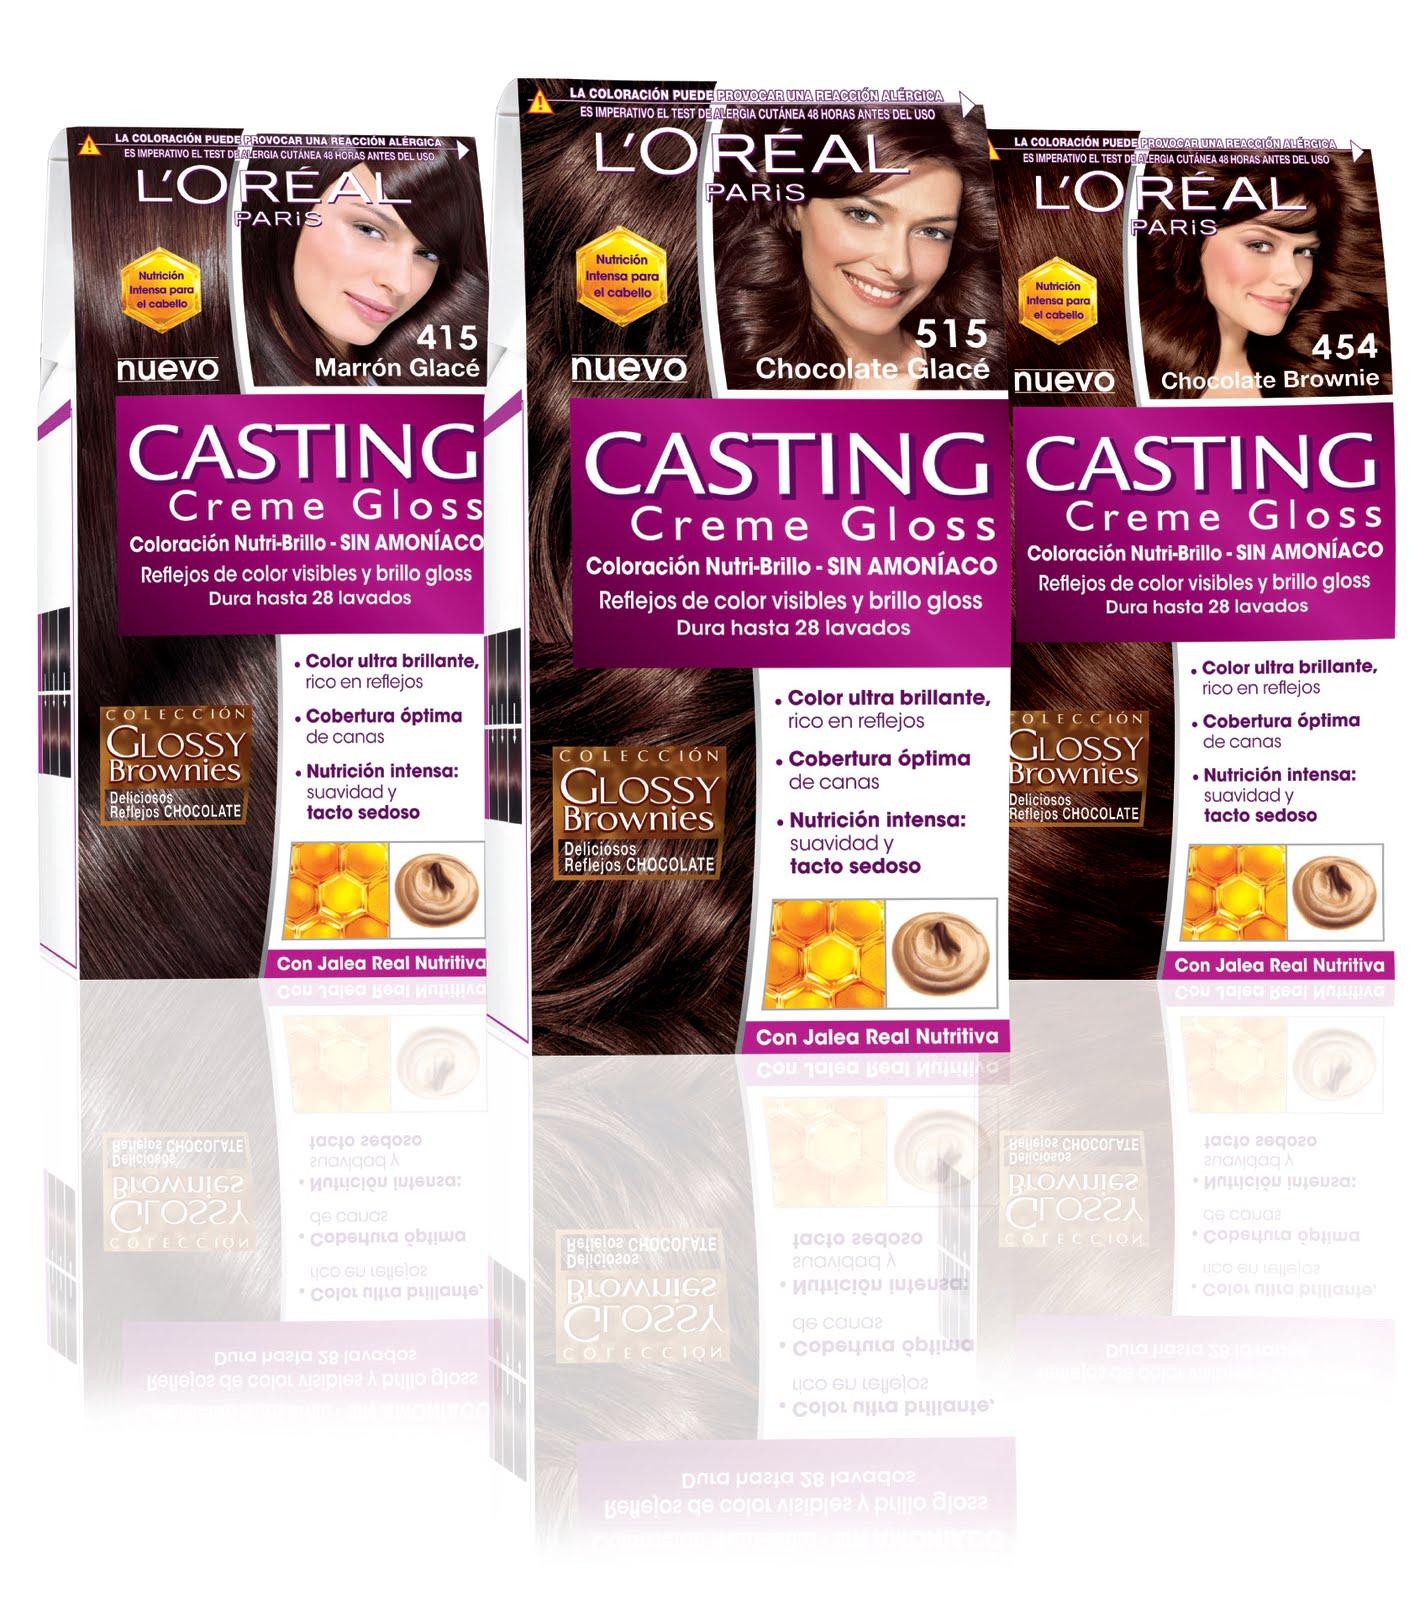 Nueva Colección Glossy Brownies de Casting Creme Gloss: Testeadora